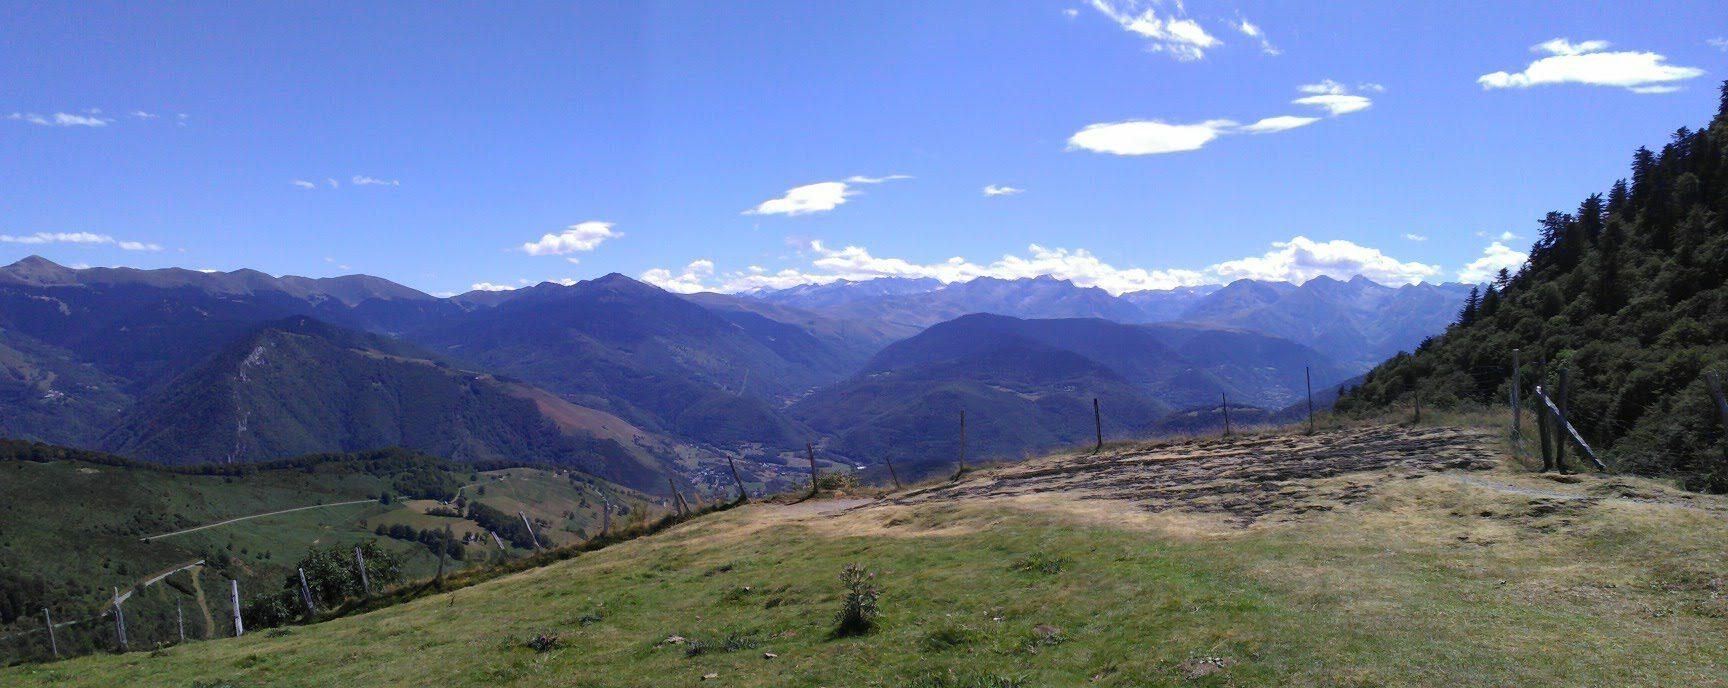 Col d'Aspin - Hautes-Pyrénées